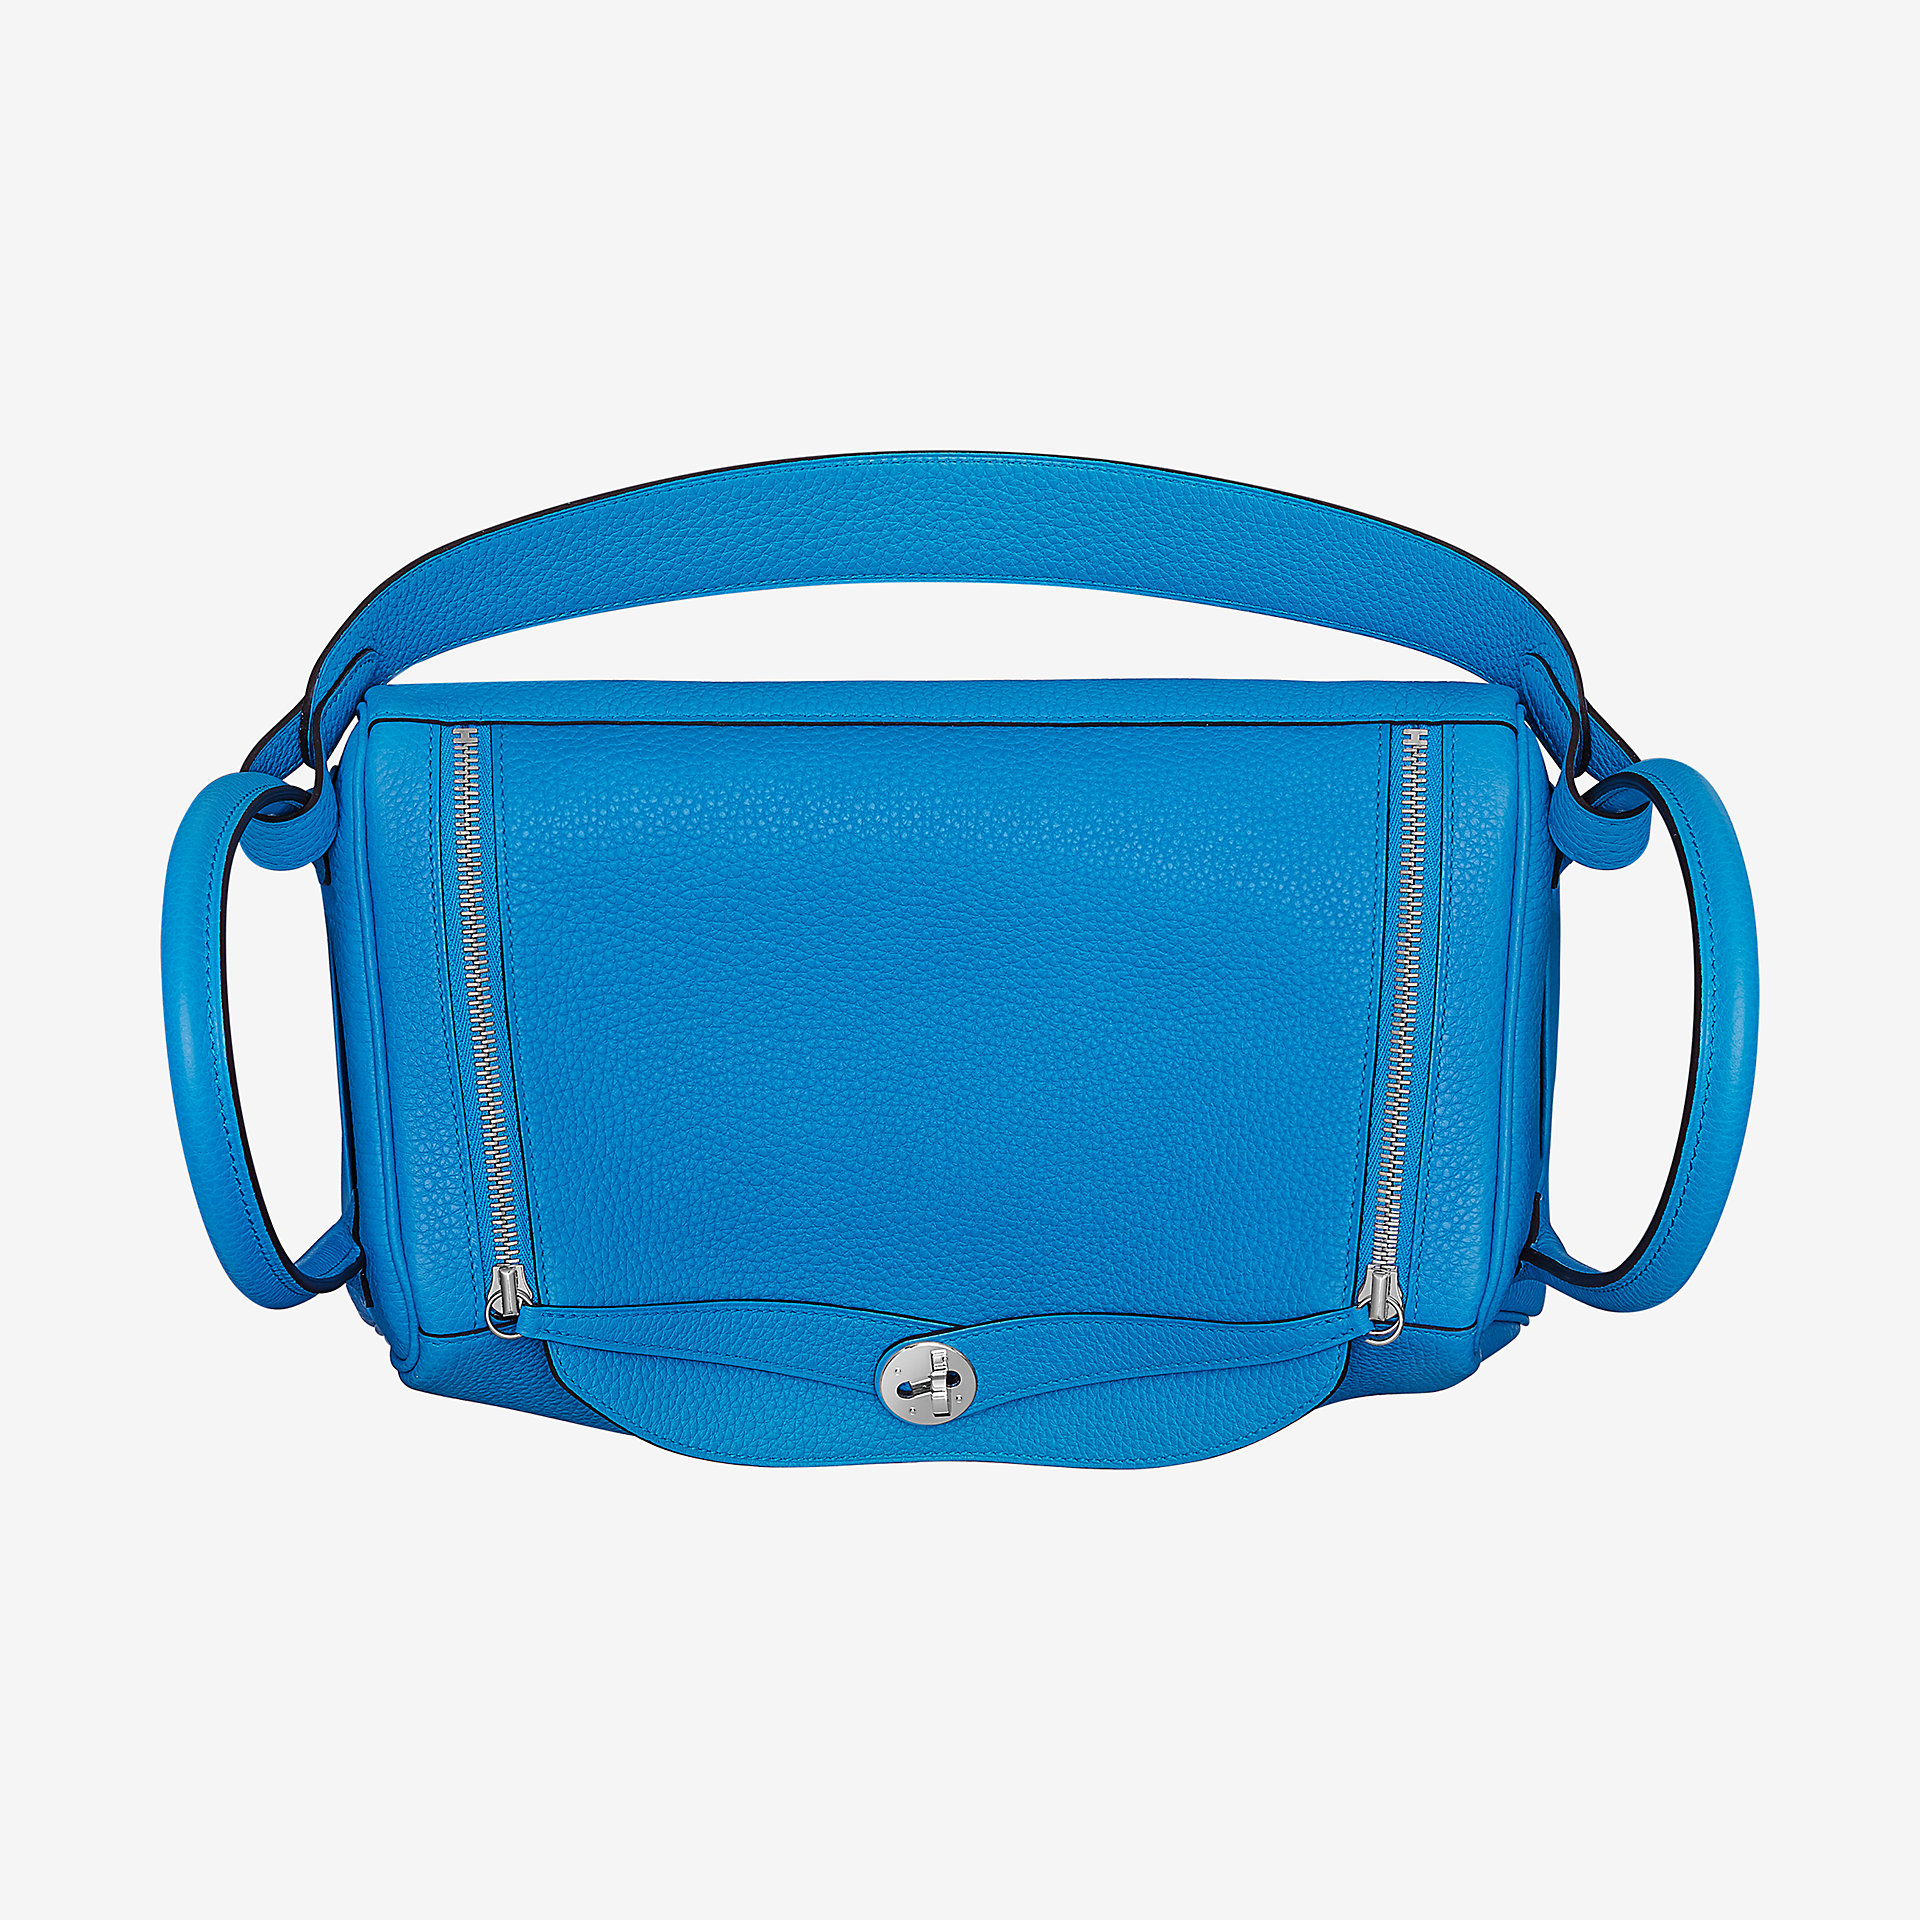 Hermes Lindy琳迪包 34 bag CKB3 taurillon Clemence leather